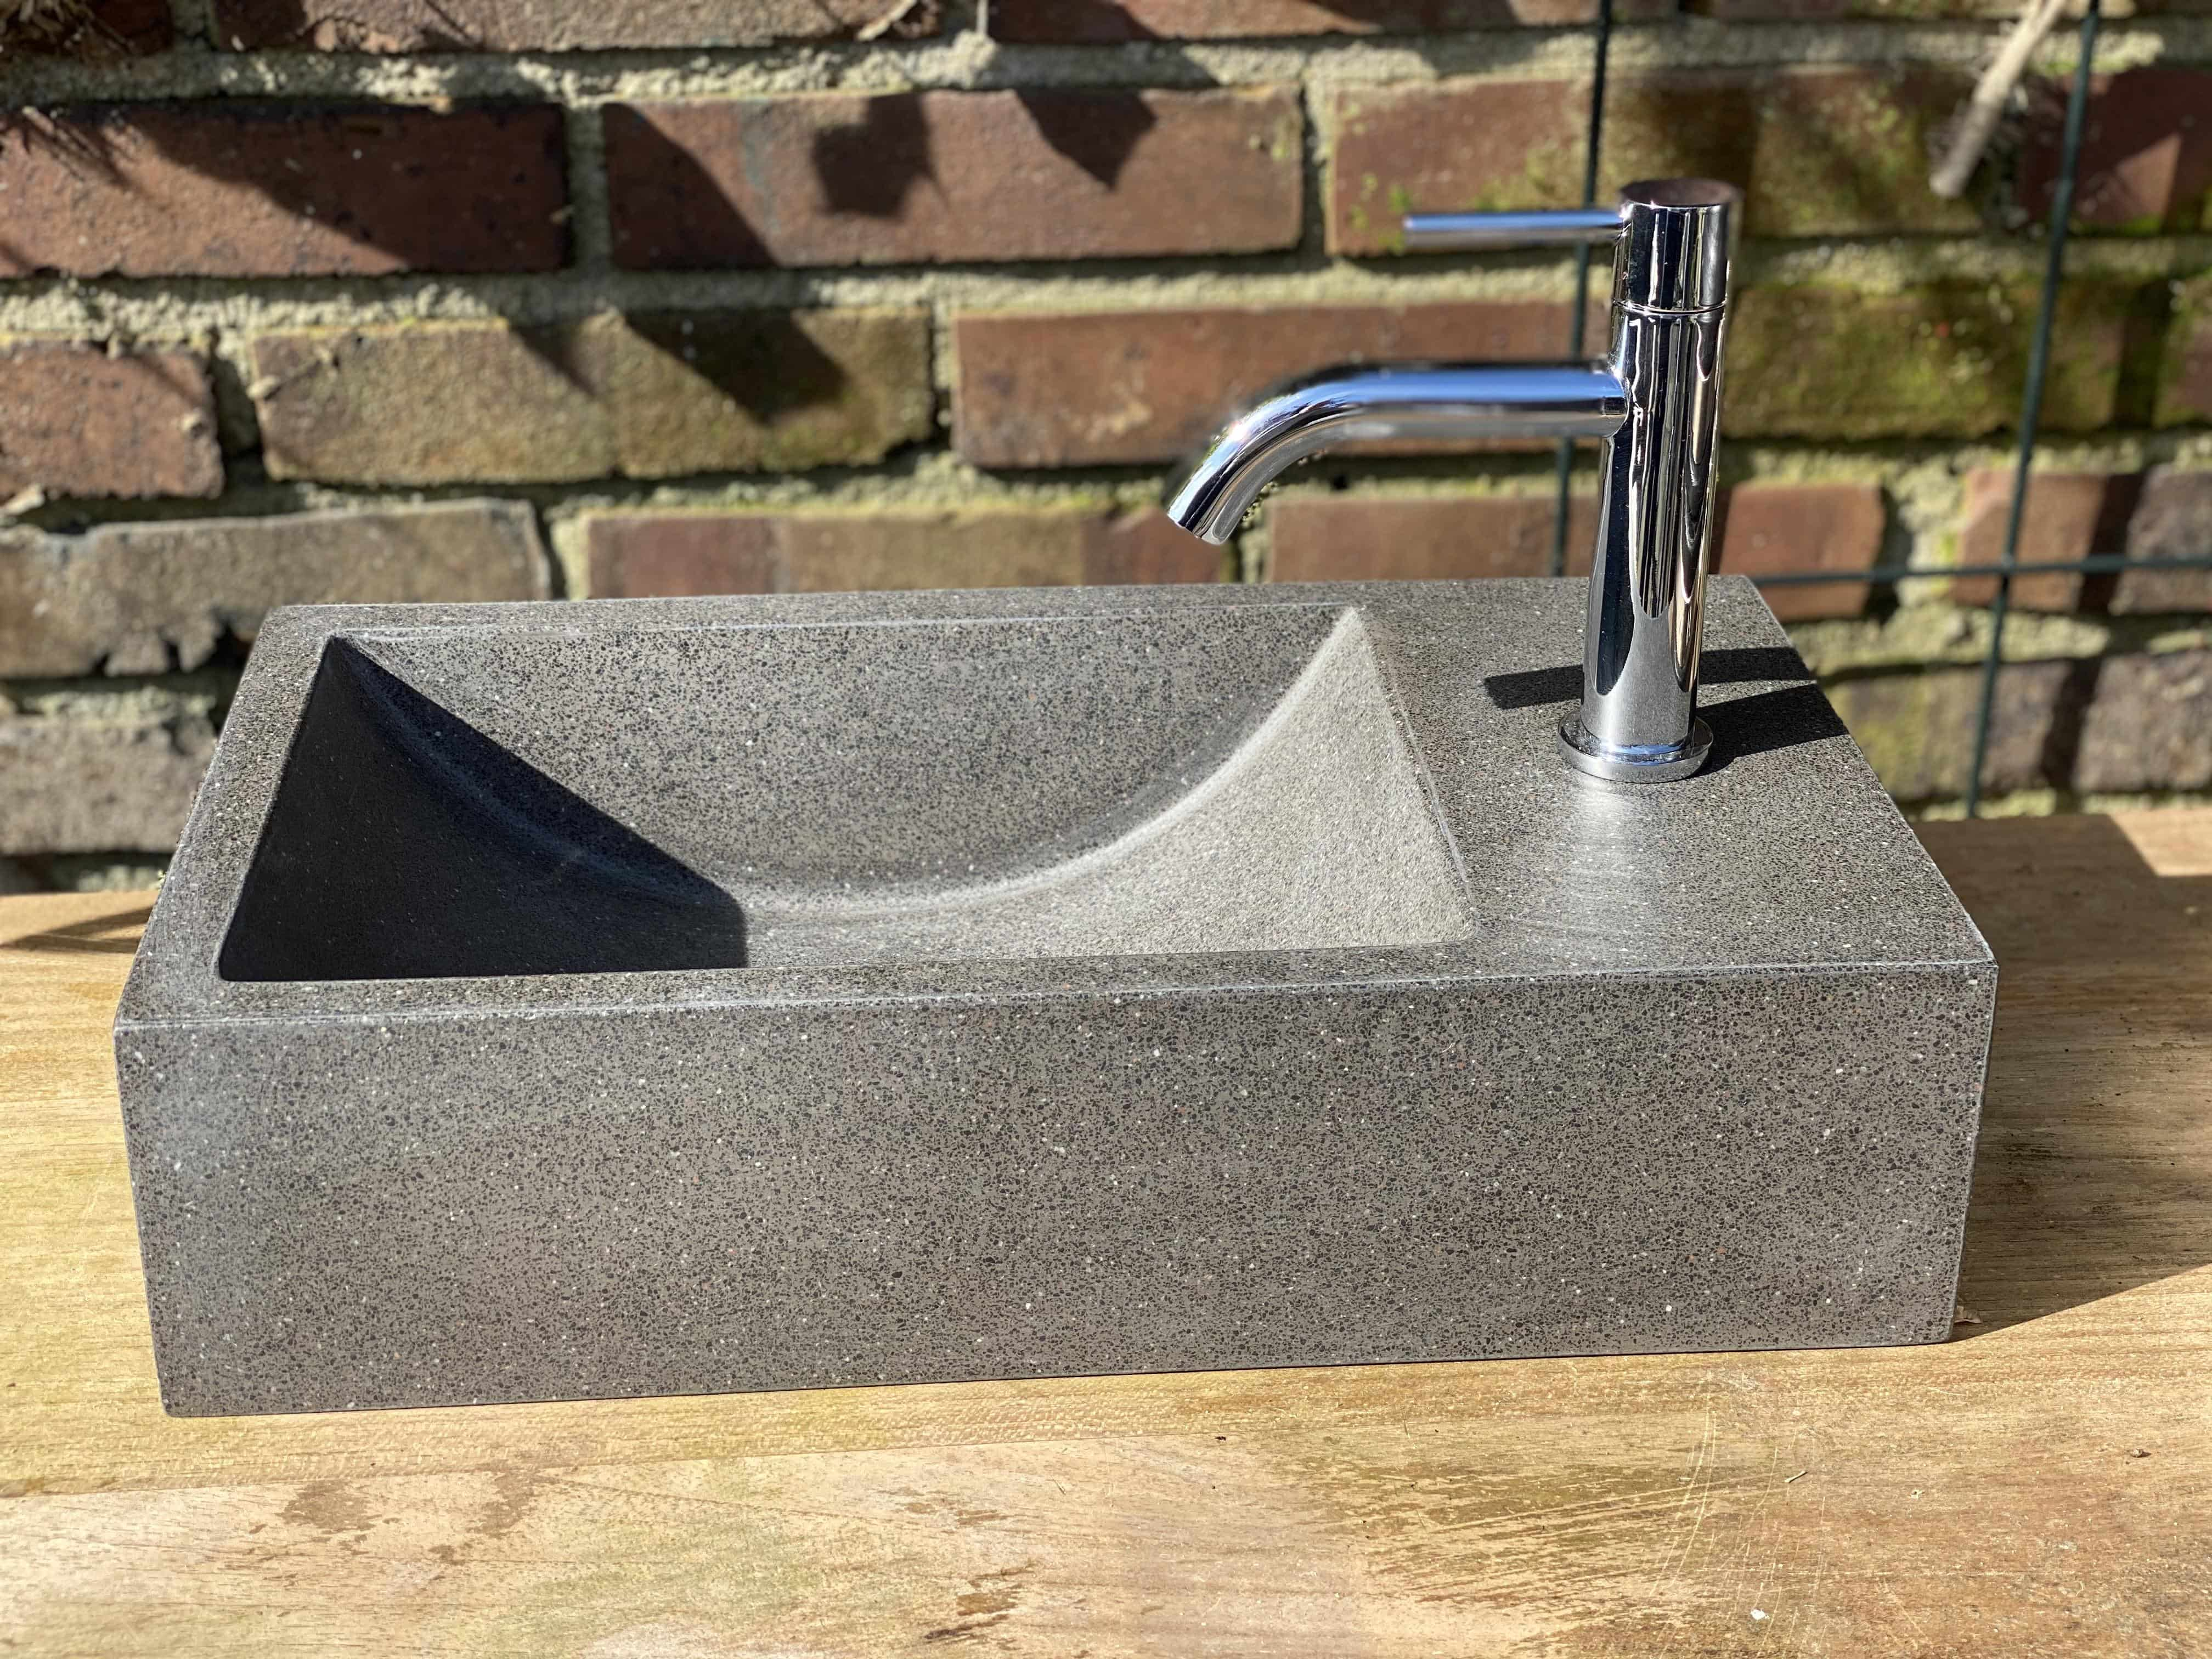 4Goodz fontein polybeton Zwart/Bruin Terrazzo - 40x22x15 cm